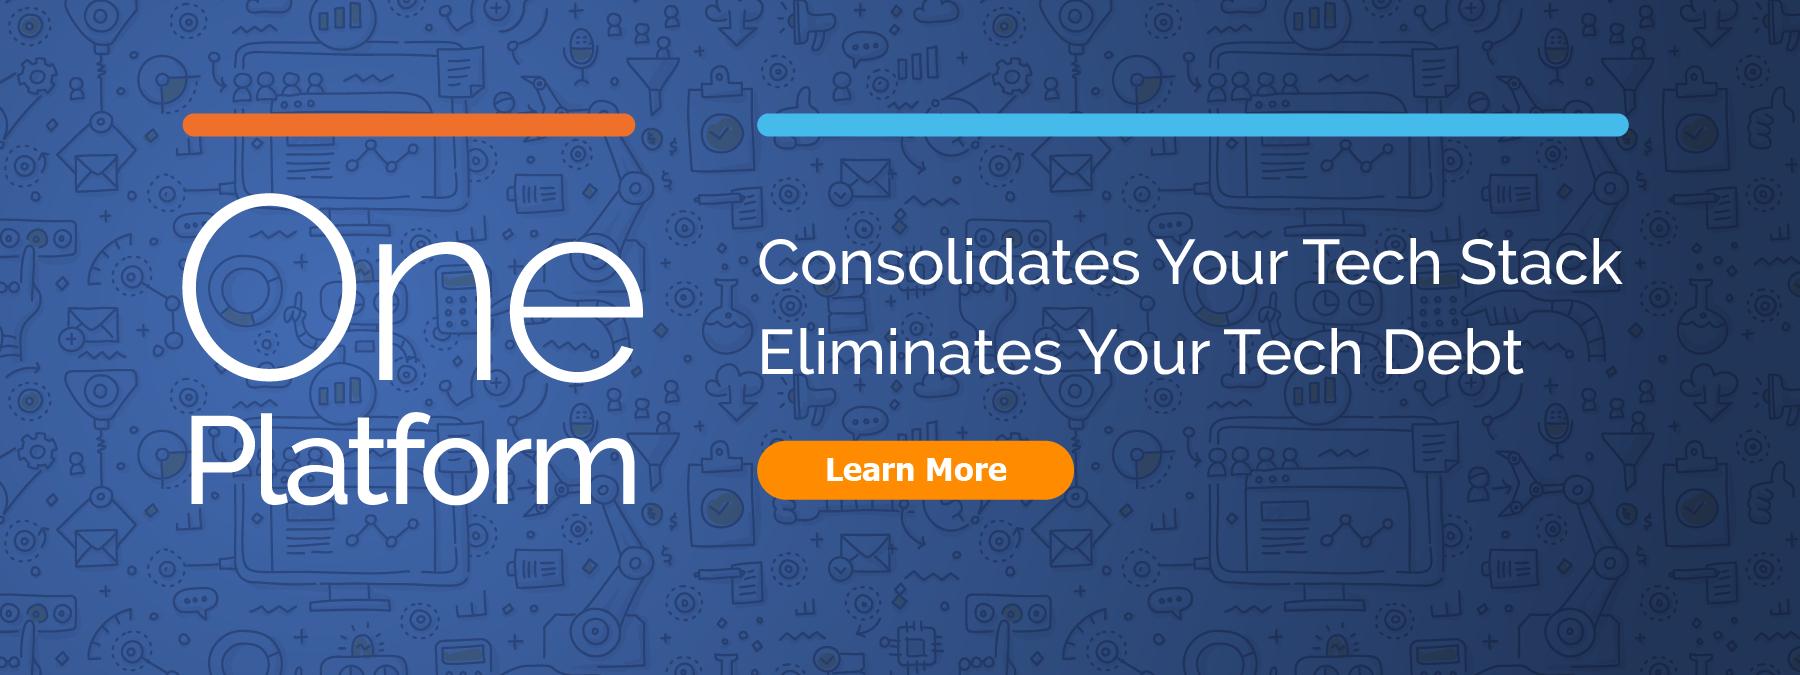 One Platform - Consolidates Your Tech Stack. Eliminates Your Tech Debt